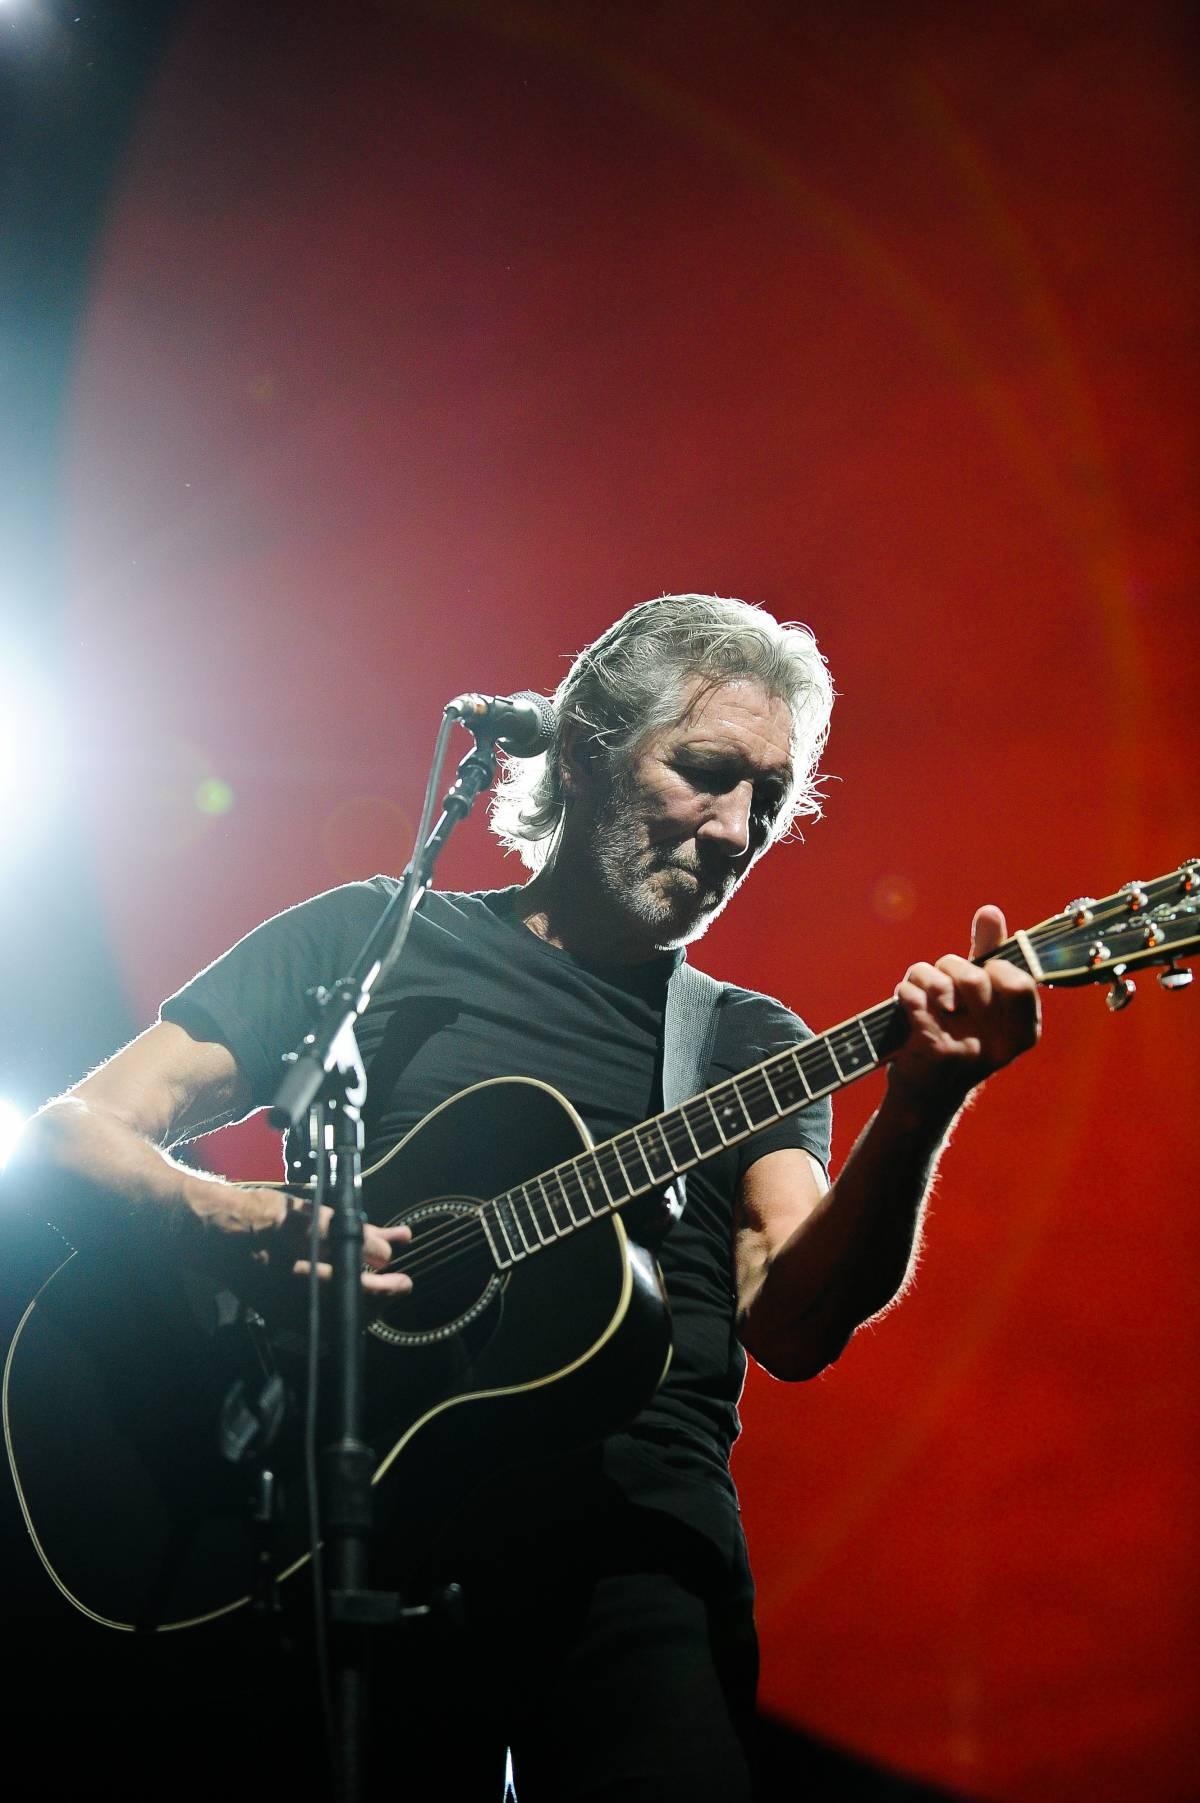 Waters contro Gilmour: ridammi i social